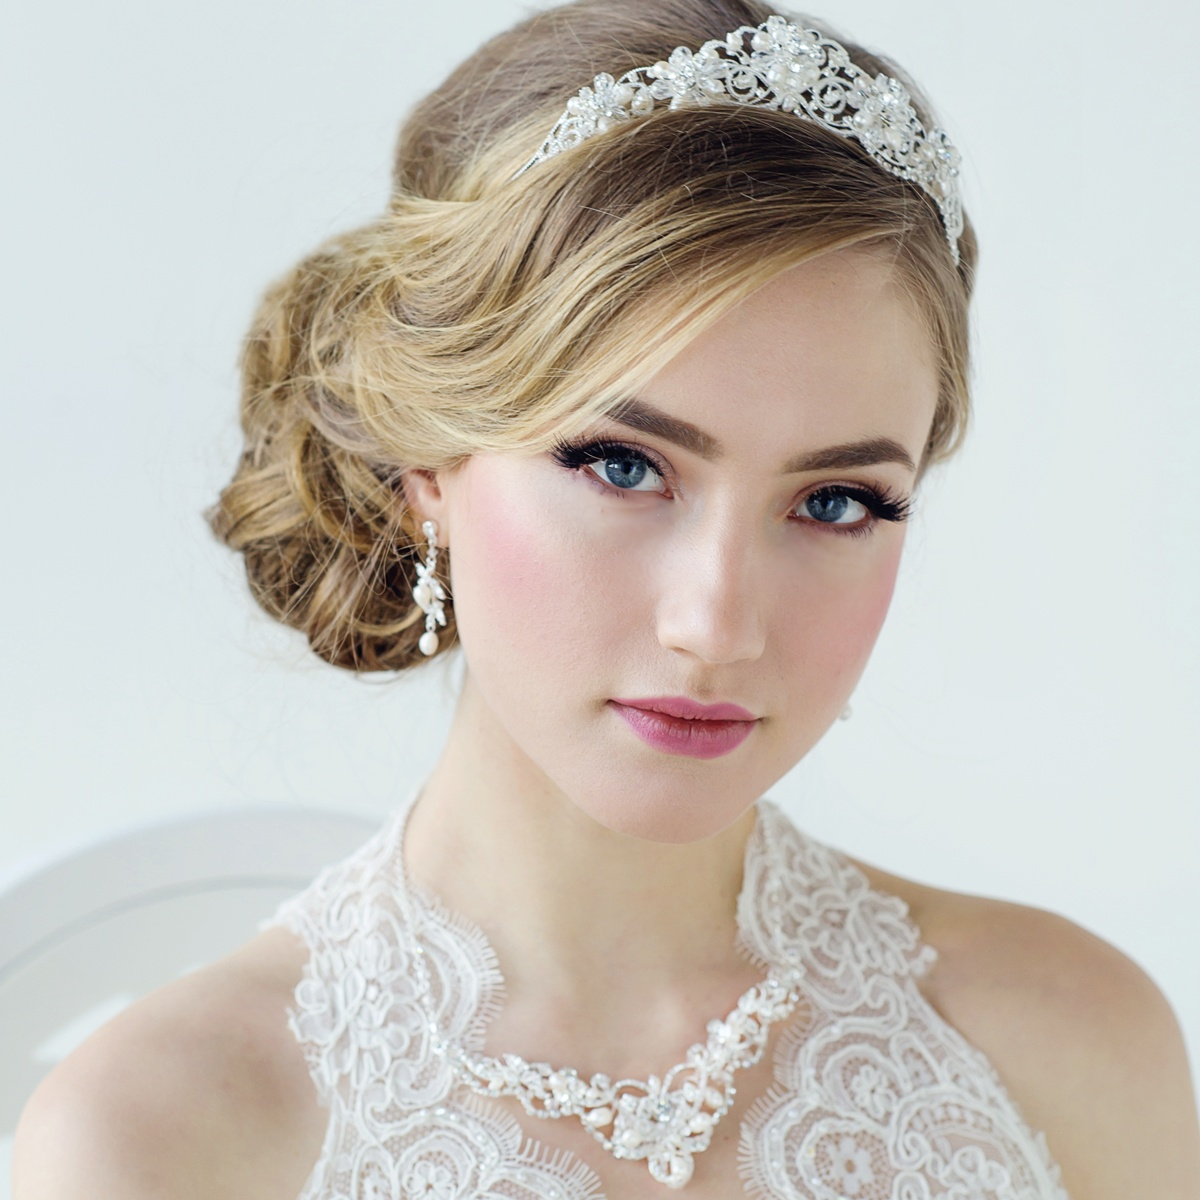 Estilo diferente do casamento mais recente Tiara Designs para noivas 2018